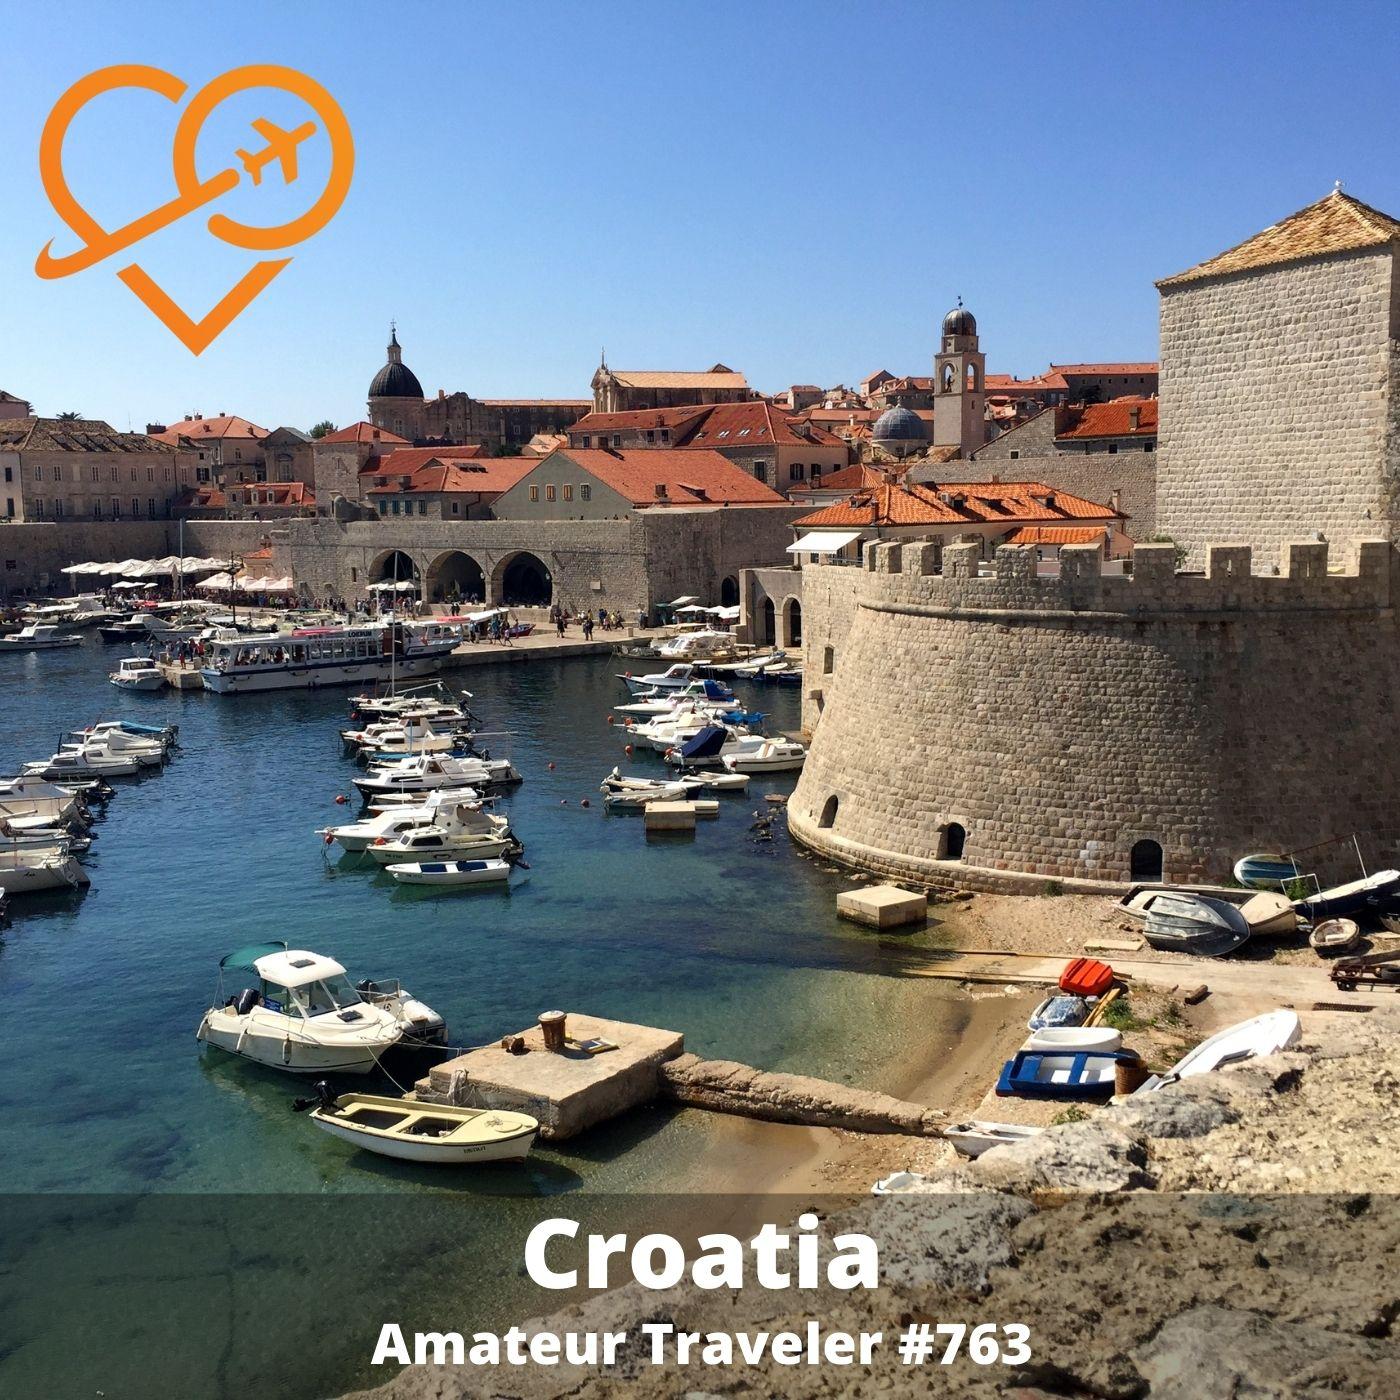 AT#763 - Travel to Croatia